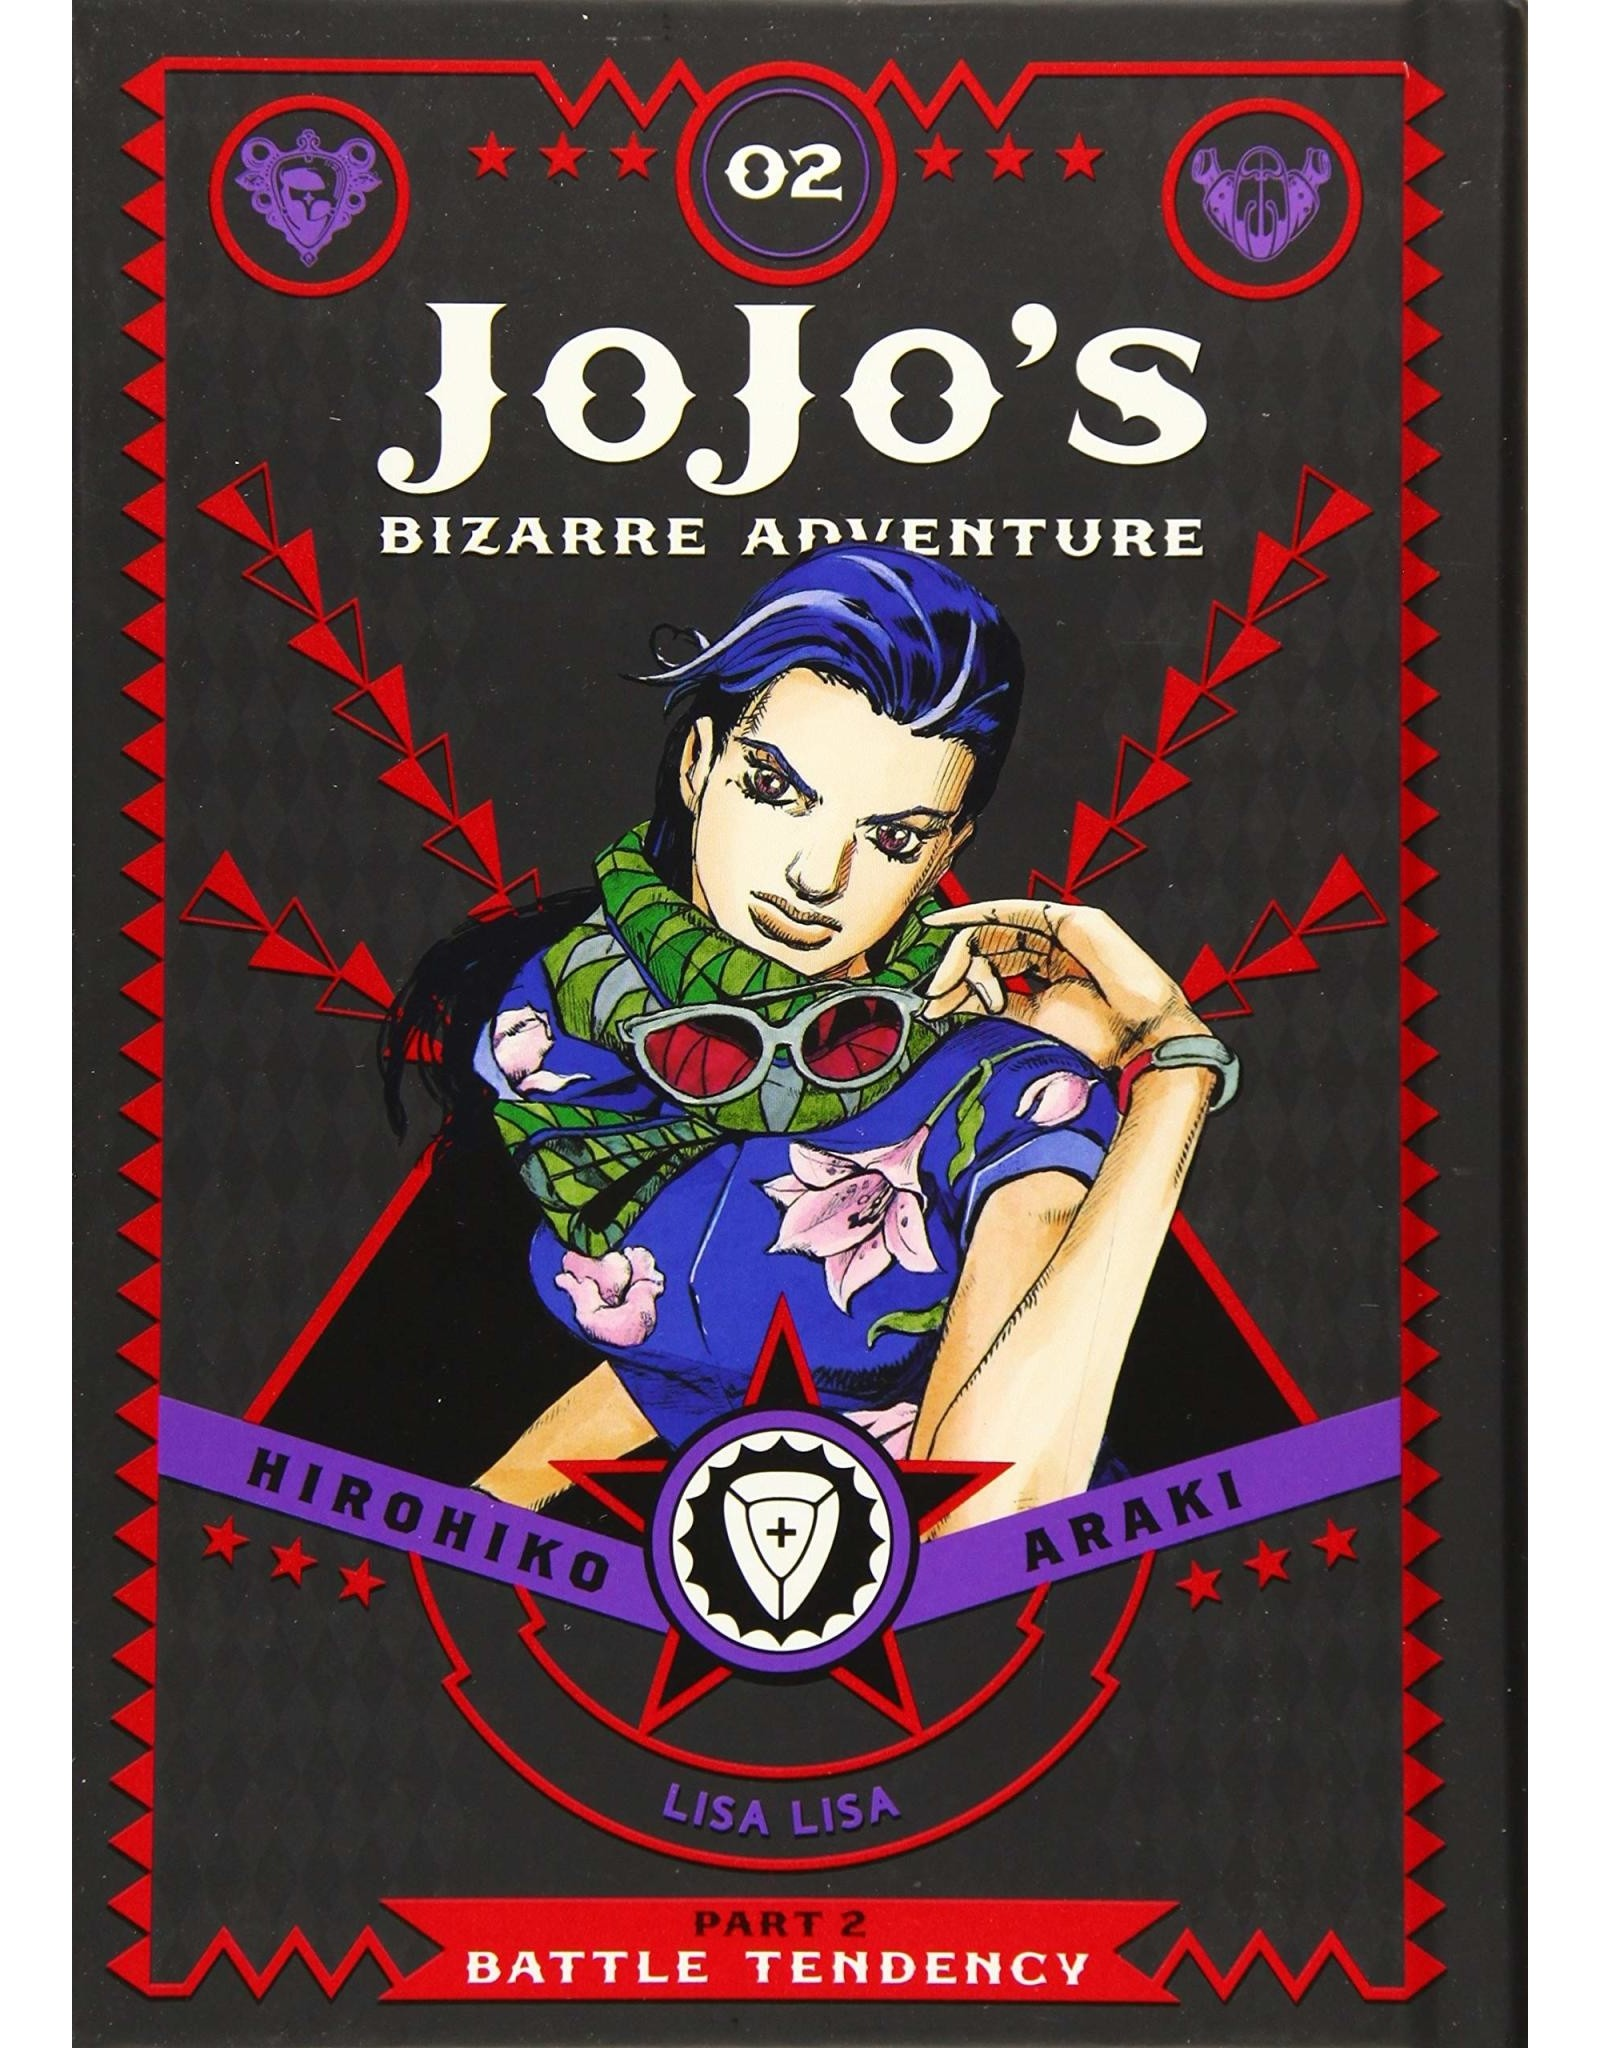 Jojo's Bizarre Adventure - Part 2: Battle Tendency - Volume 2 - Hardcover (Engelstalig)